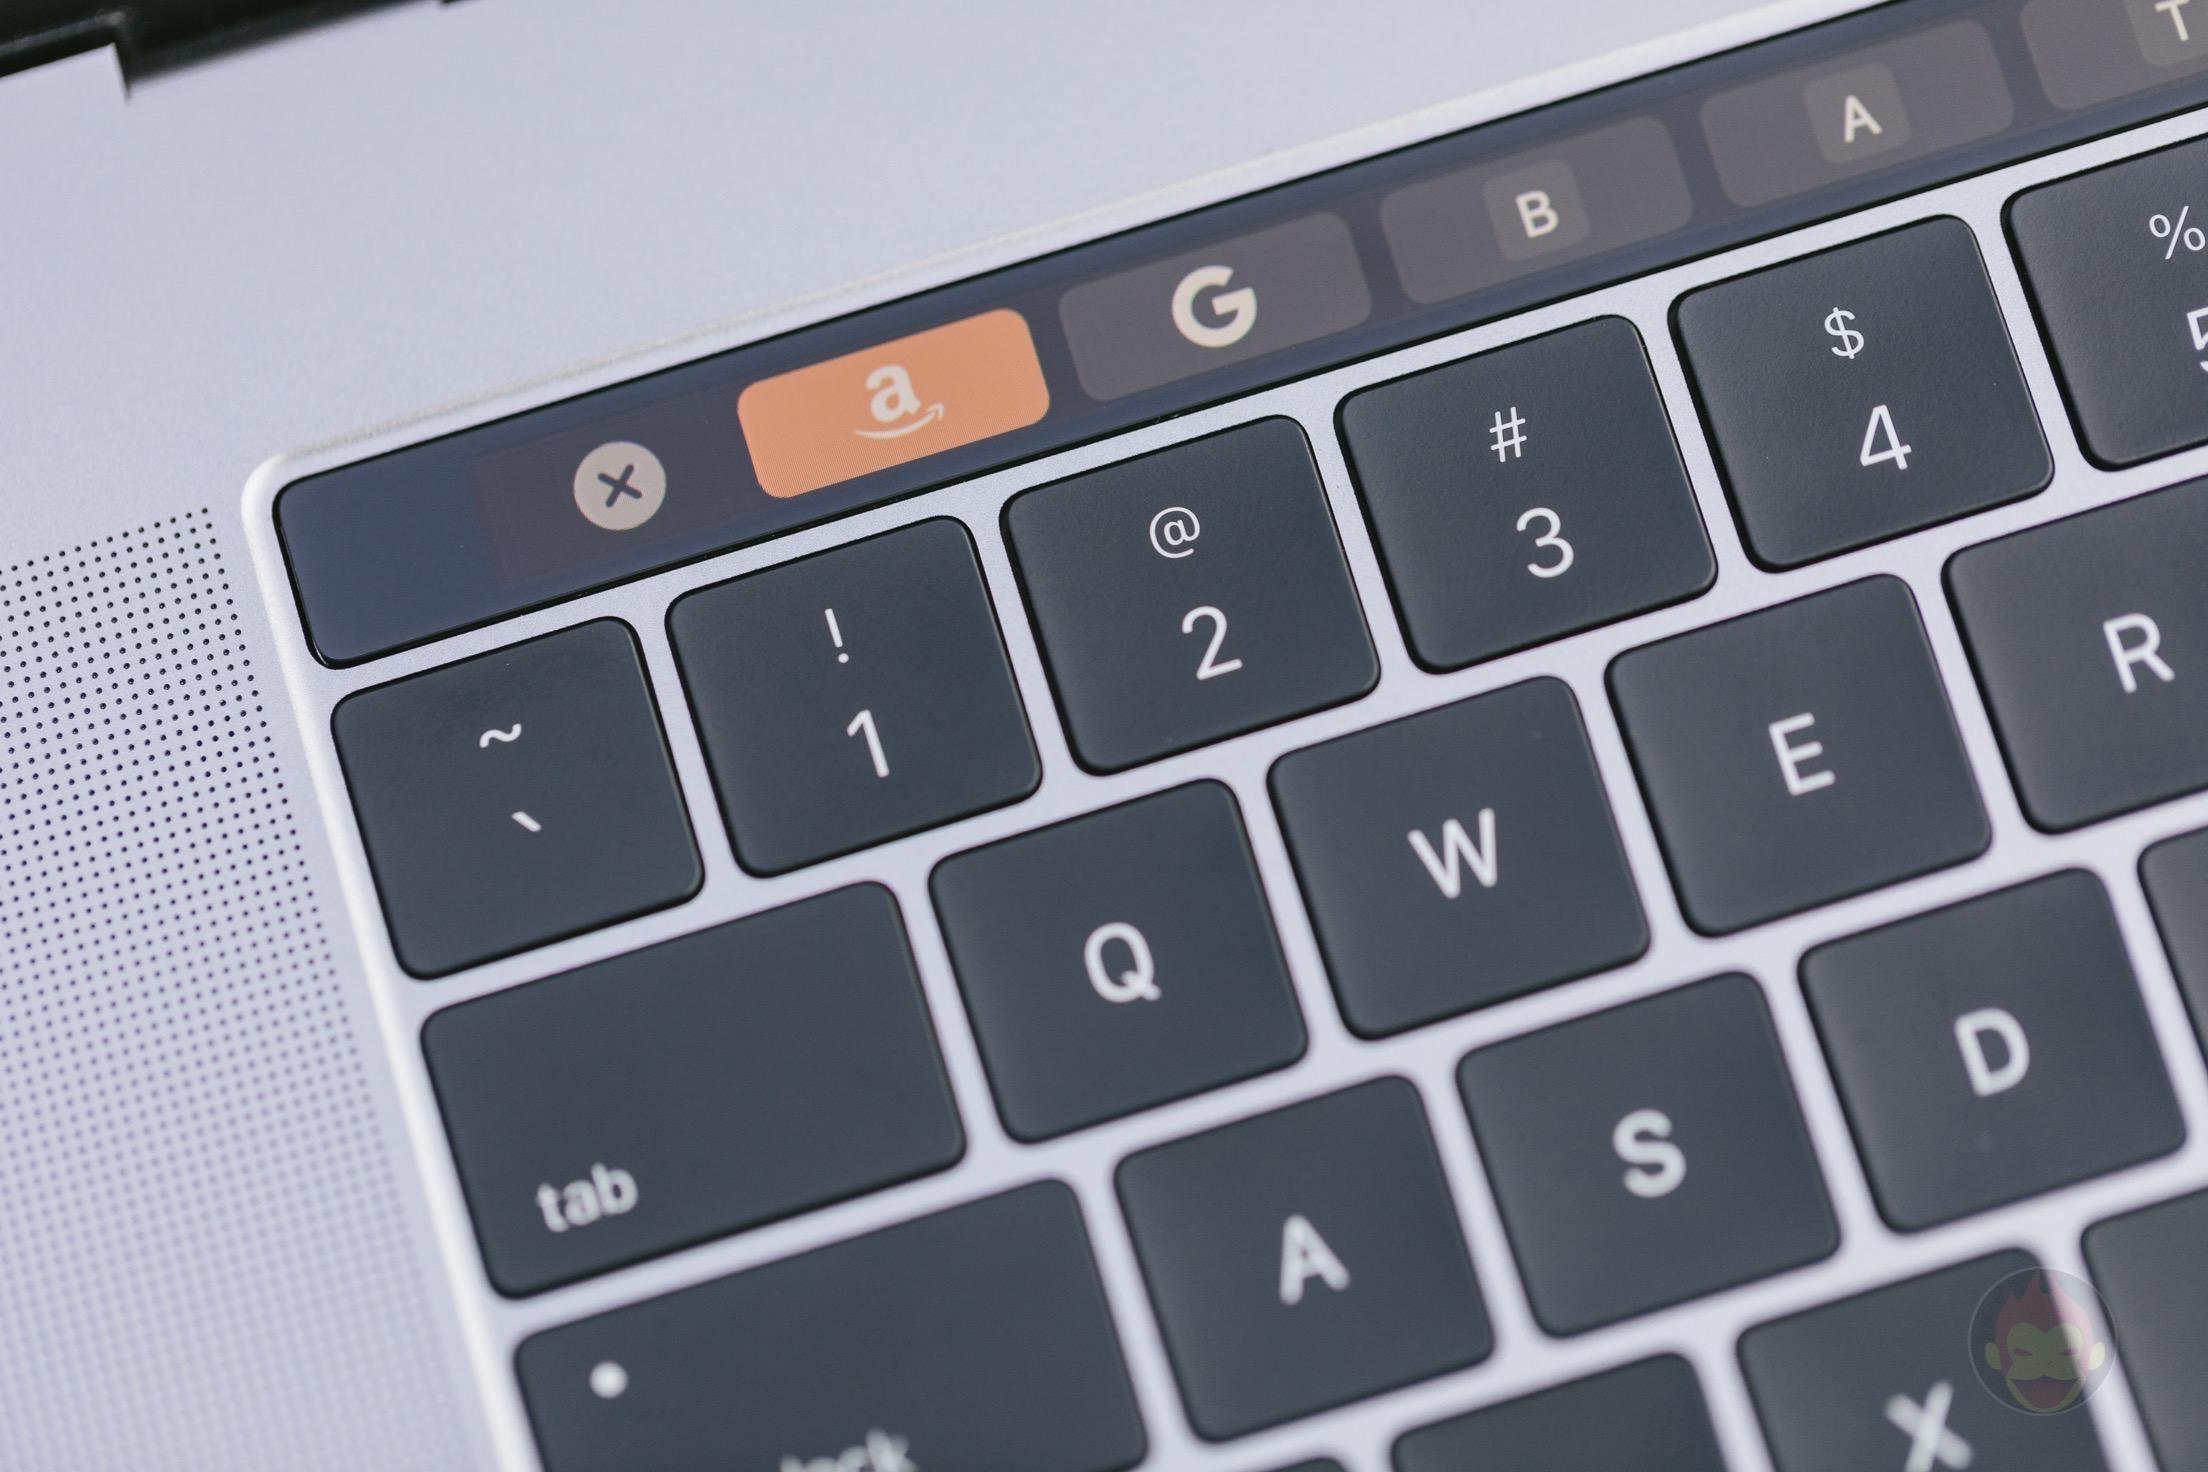 MacBook-Pro-Late2016-15inch-model-photos-12.jpg